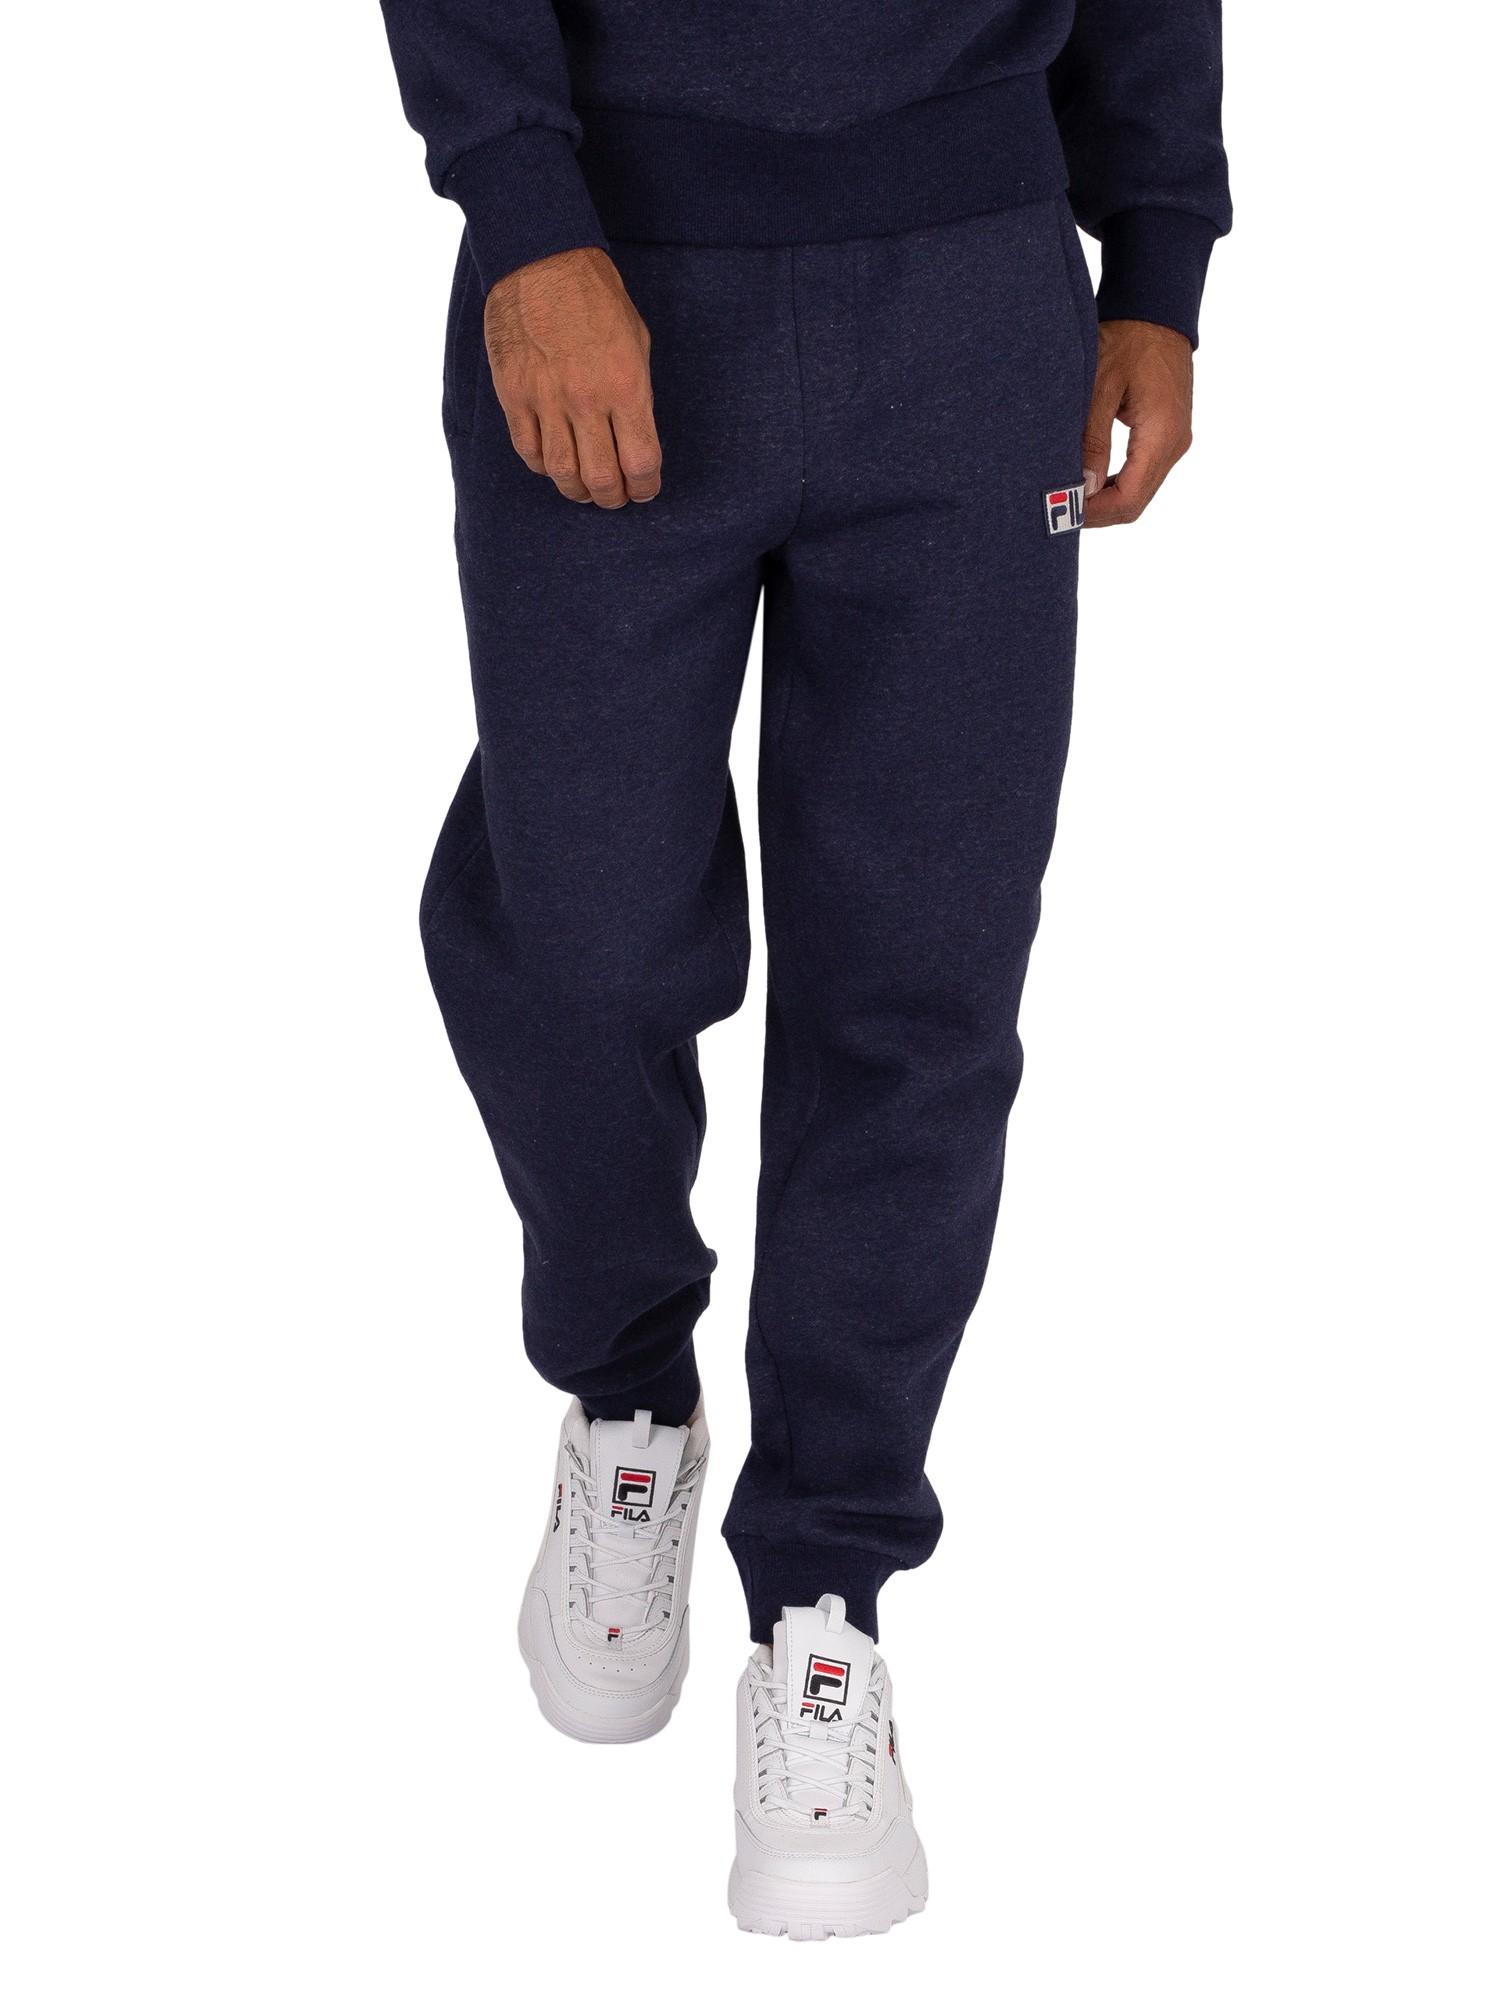 Mens Loose Cargo Combat TAPERED pantalon avec cordon de serrage Pantalon Pantalon De Jogging